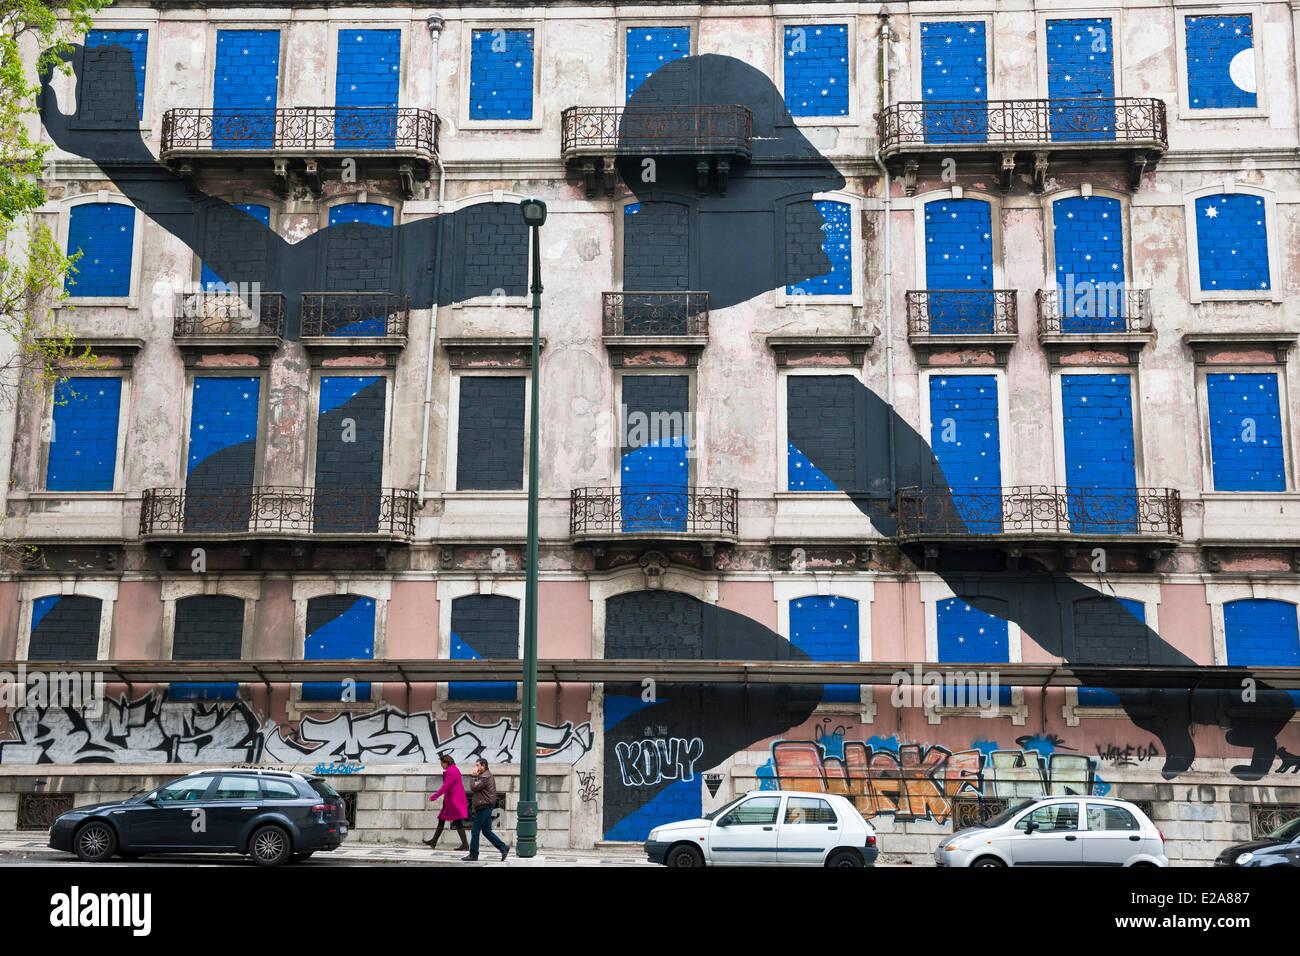 Portugal, Lisboa, el artista italiano BLU se unió con la bresilian Os Gemeos para materializar un gigantesco Imagen De Stock